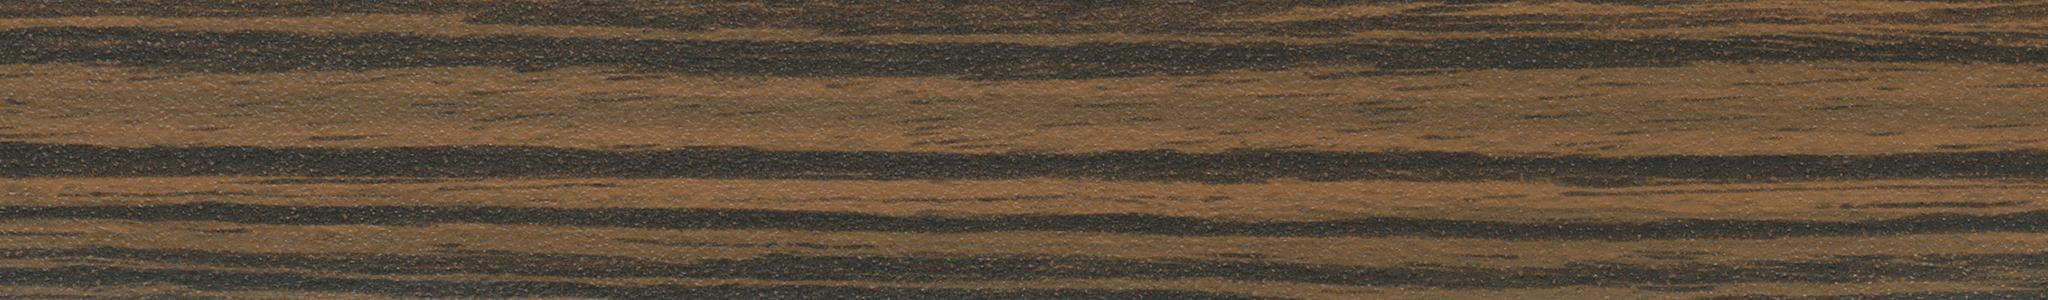 HD 293025 ABS hrana makassar perla